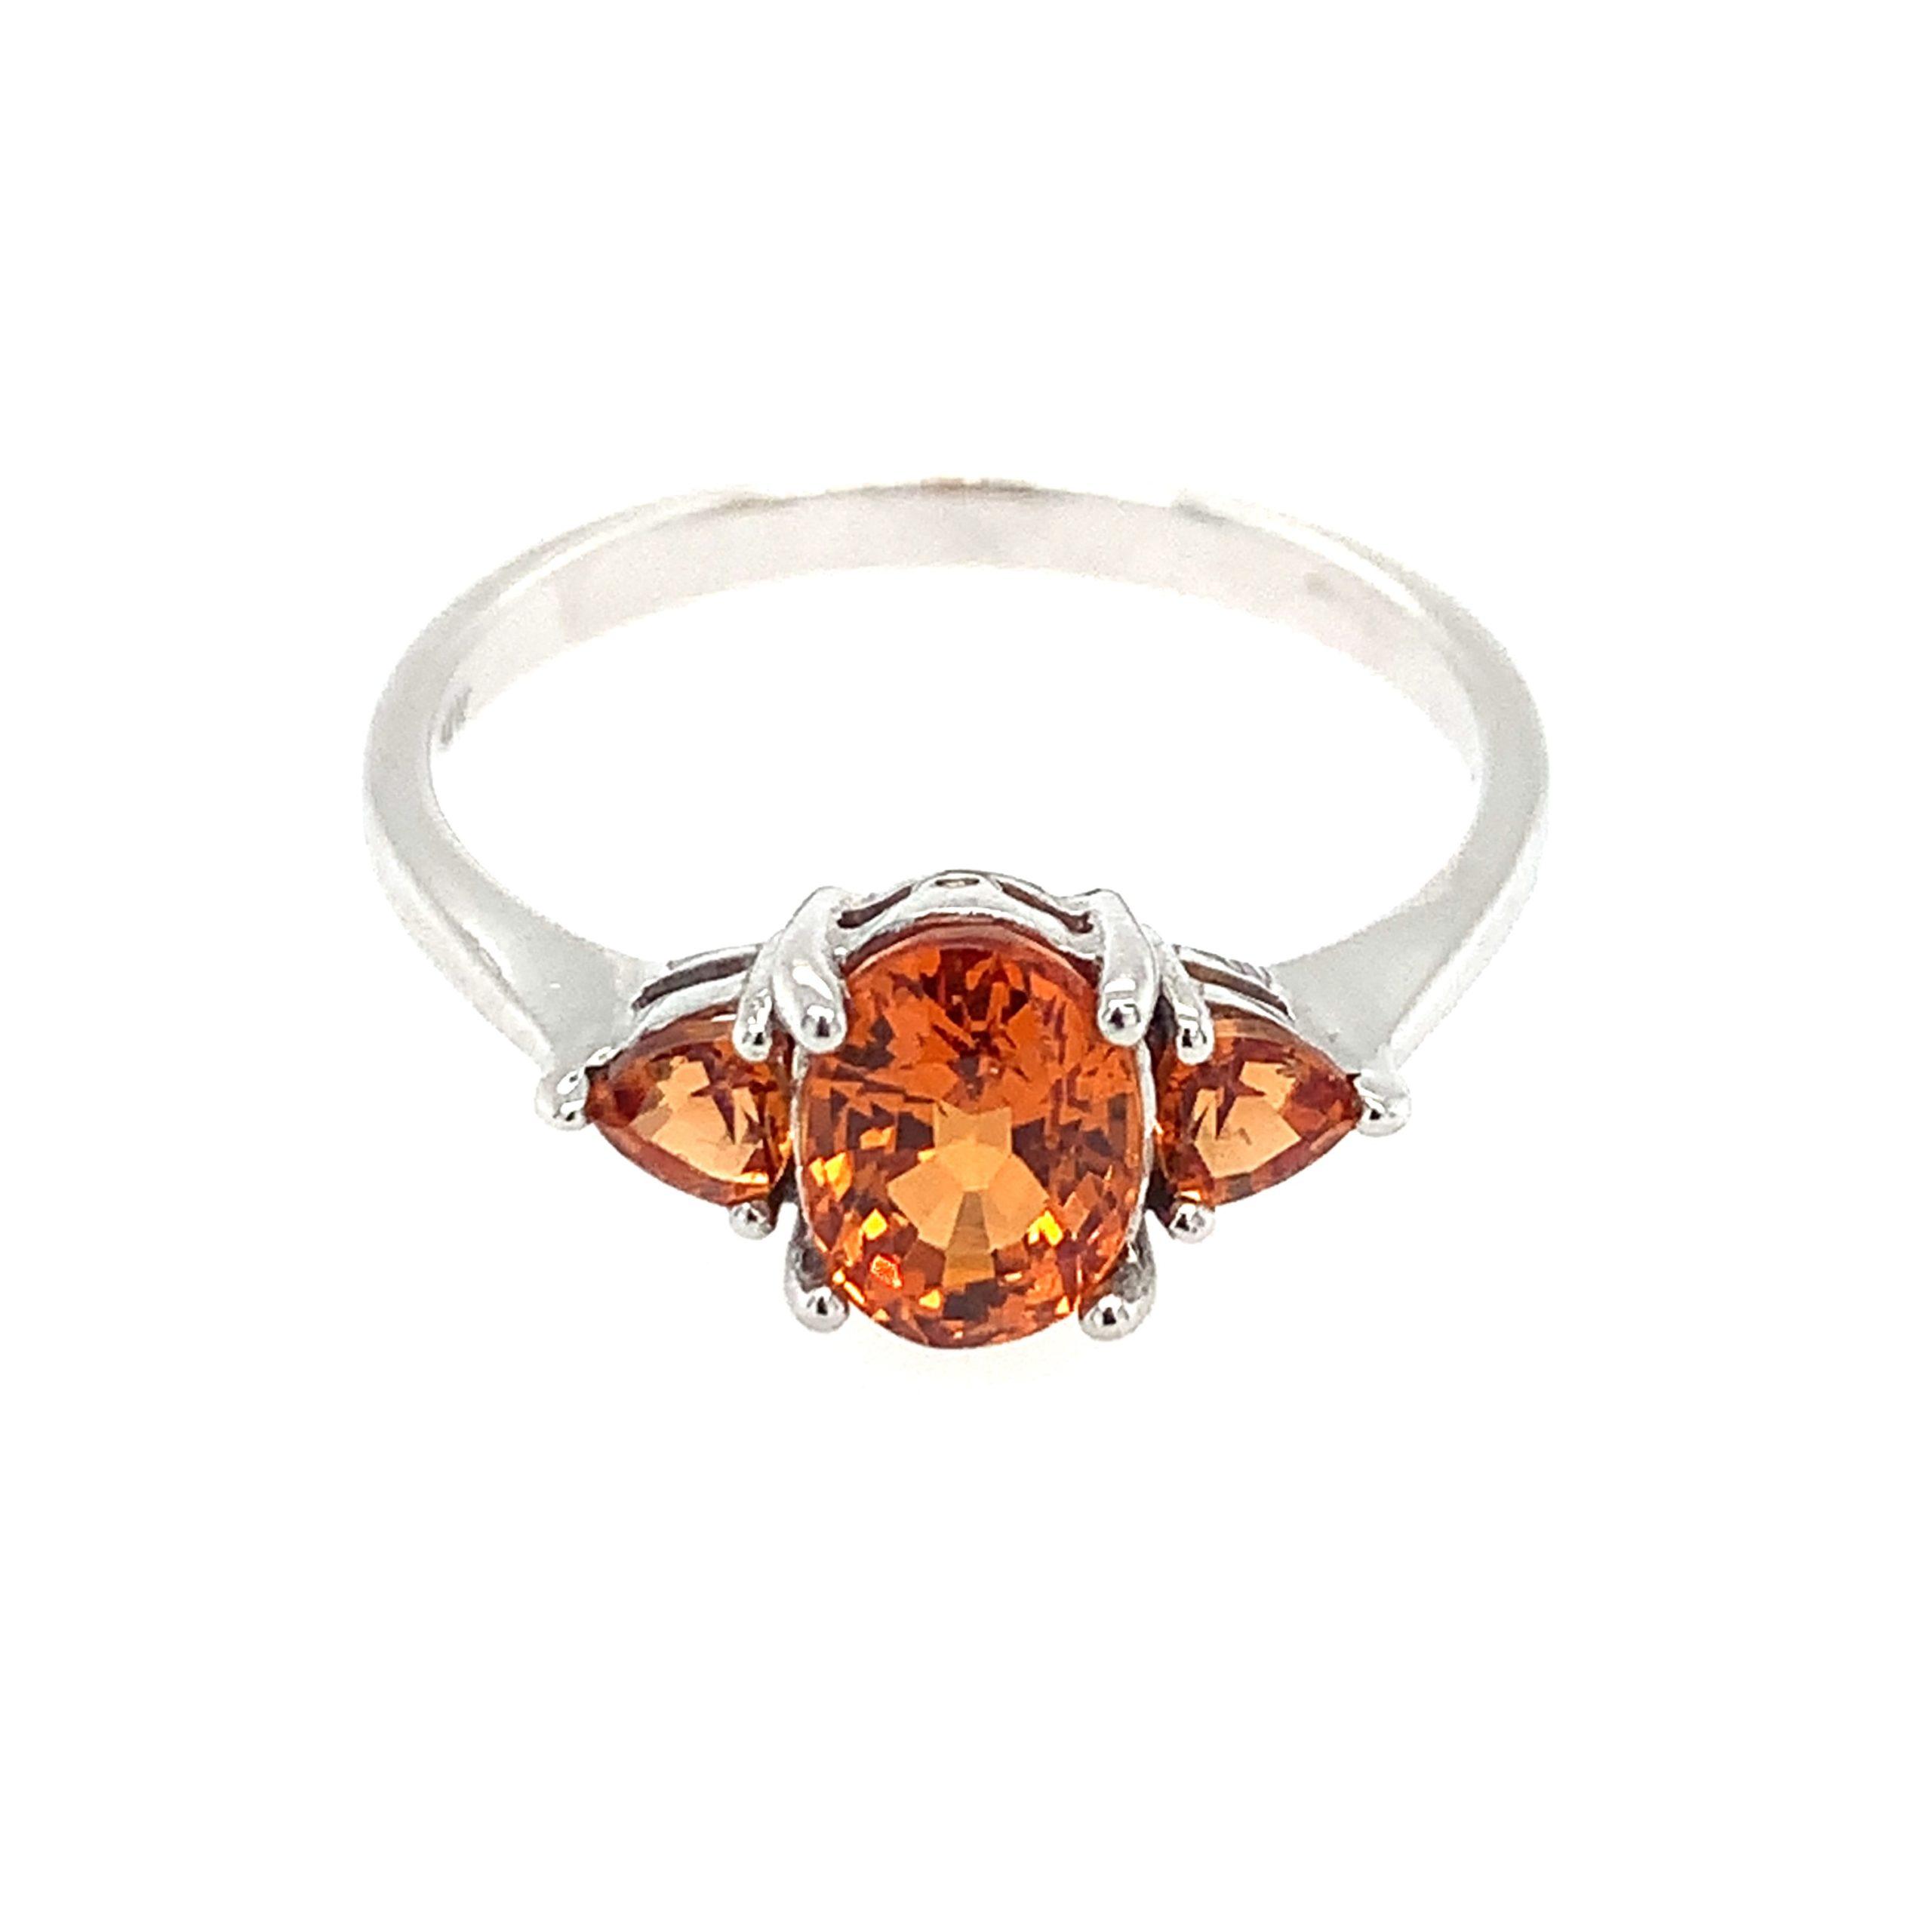 White Gold Three-Stone Mandarin Garnet Ring